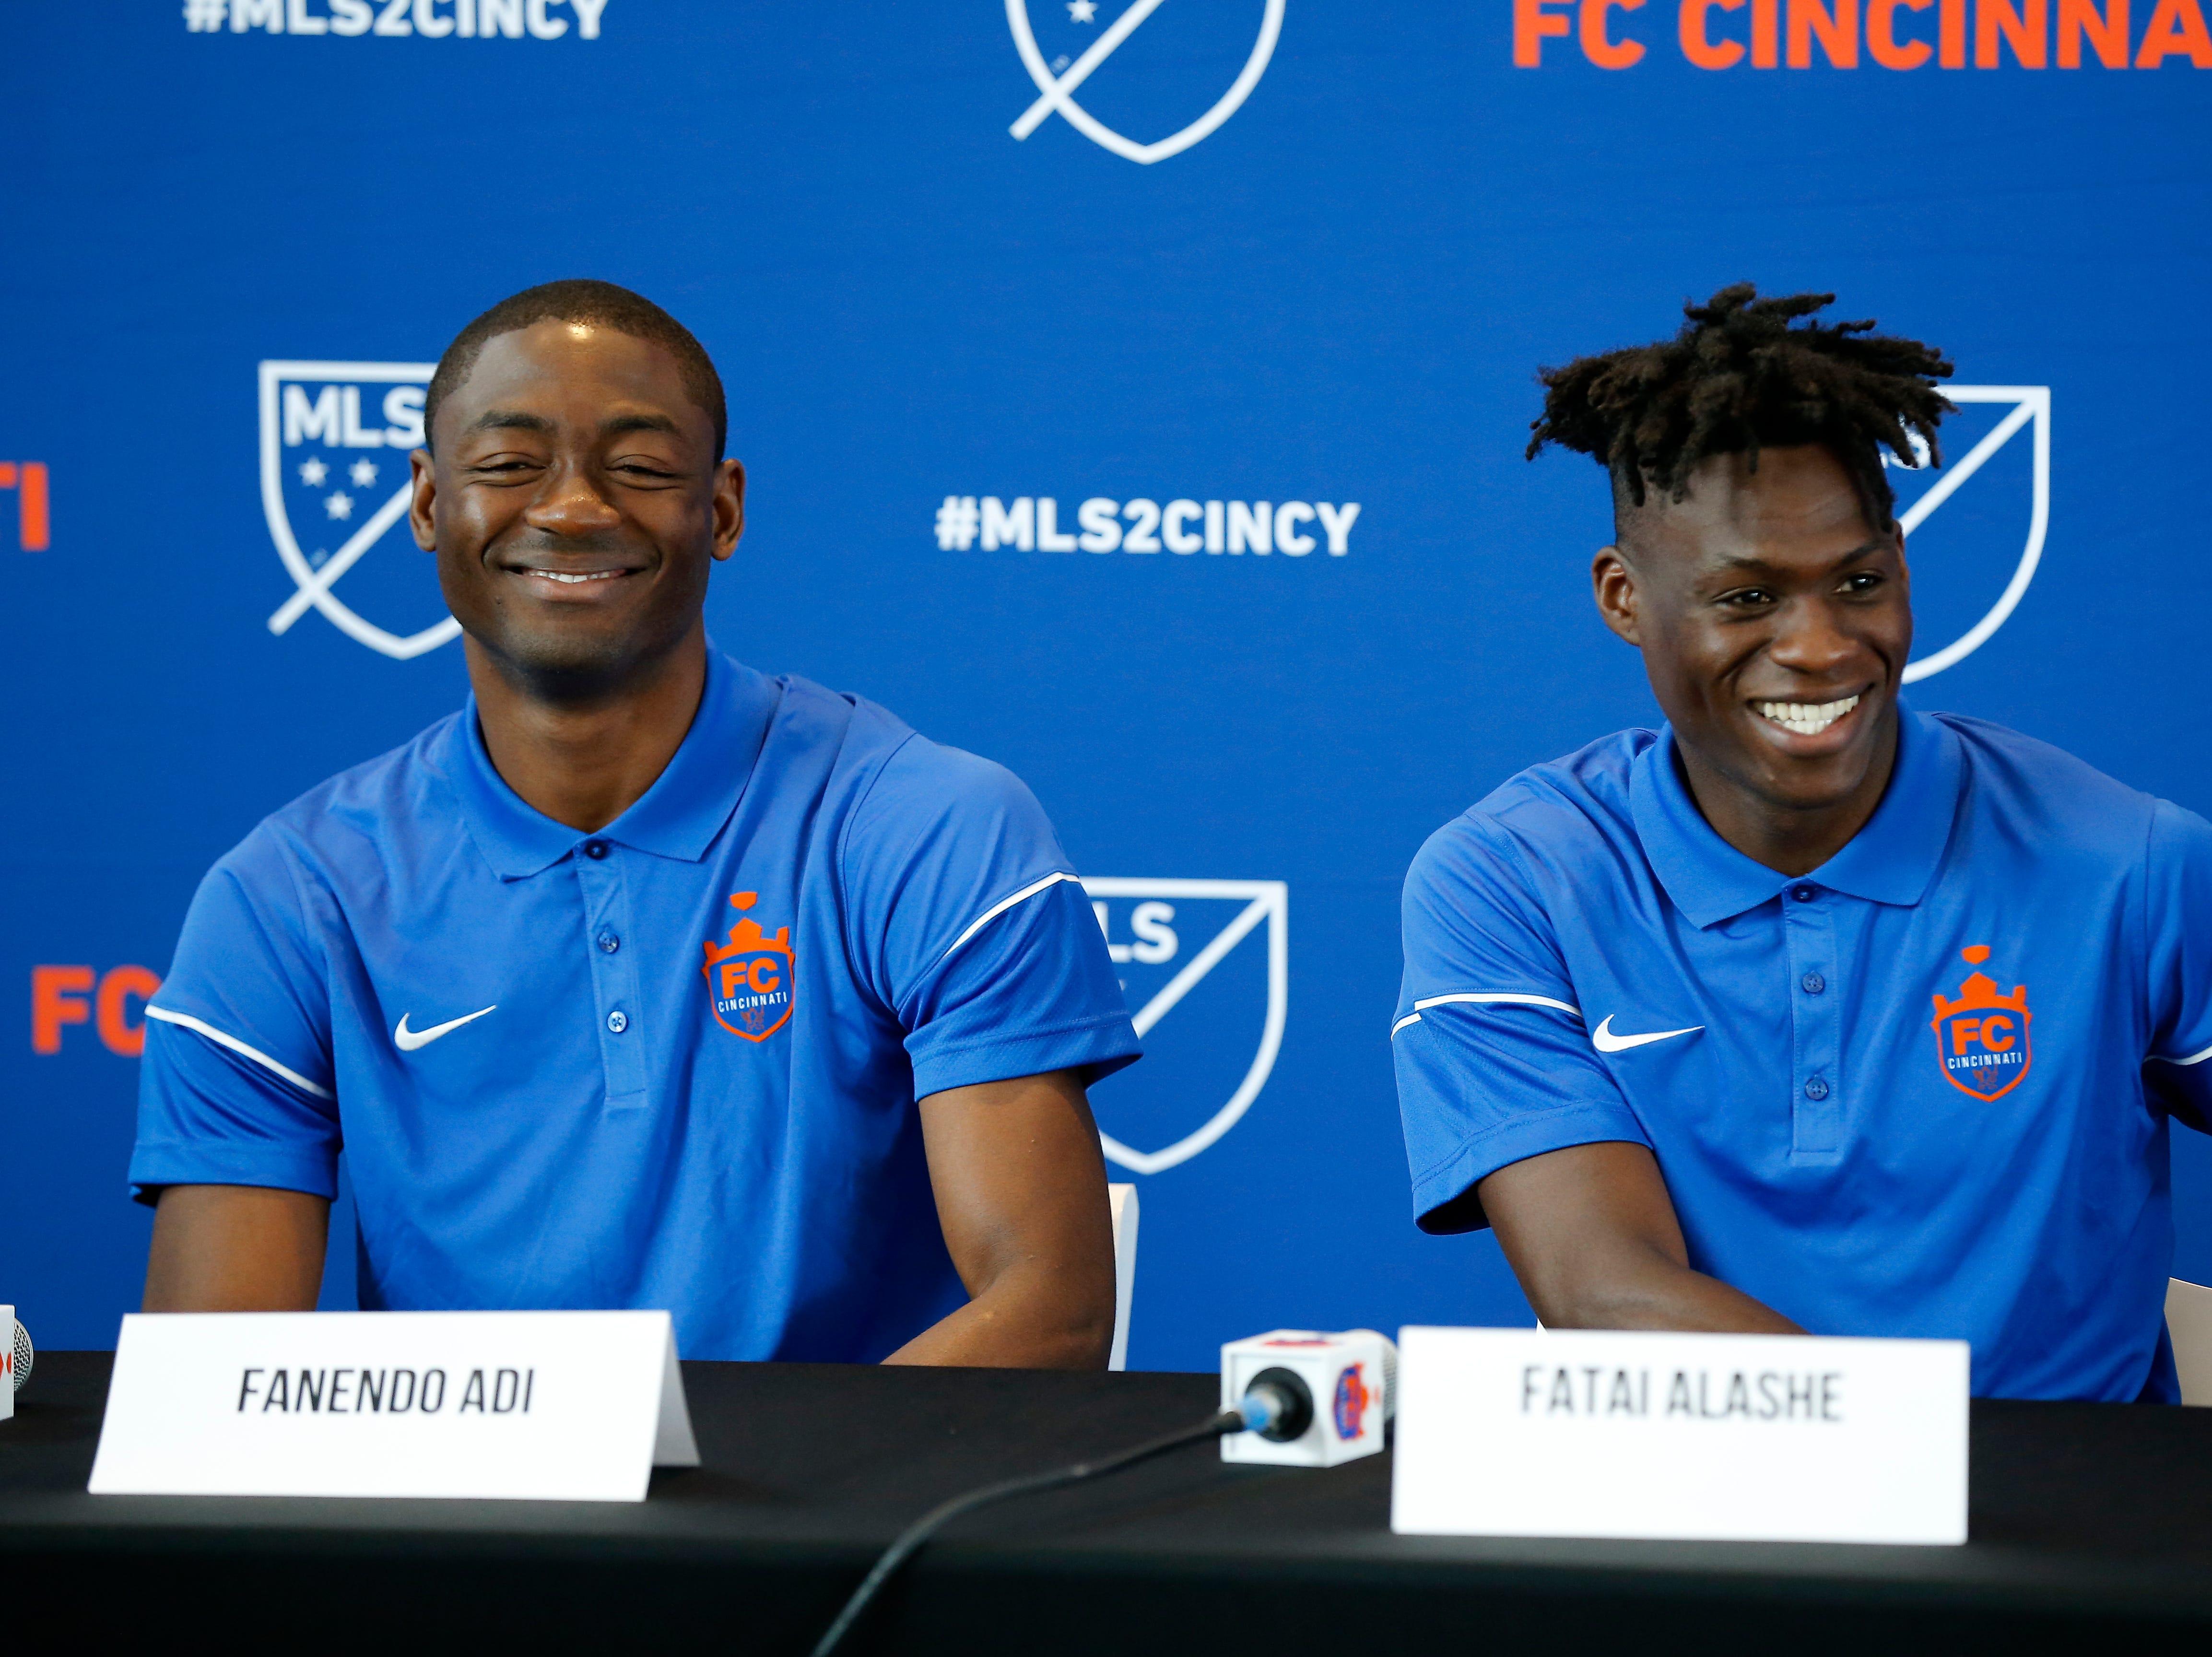 New FC Cincinnati signees Fanendo Adi and Fatai Alashe take questions during a press conference at Nippert Stadium in Cincinnati on Monday, July 30, 2018.